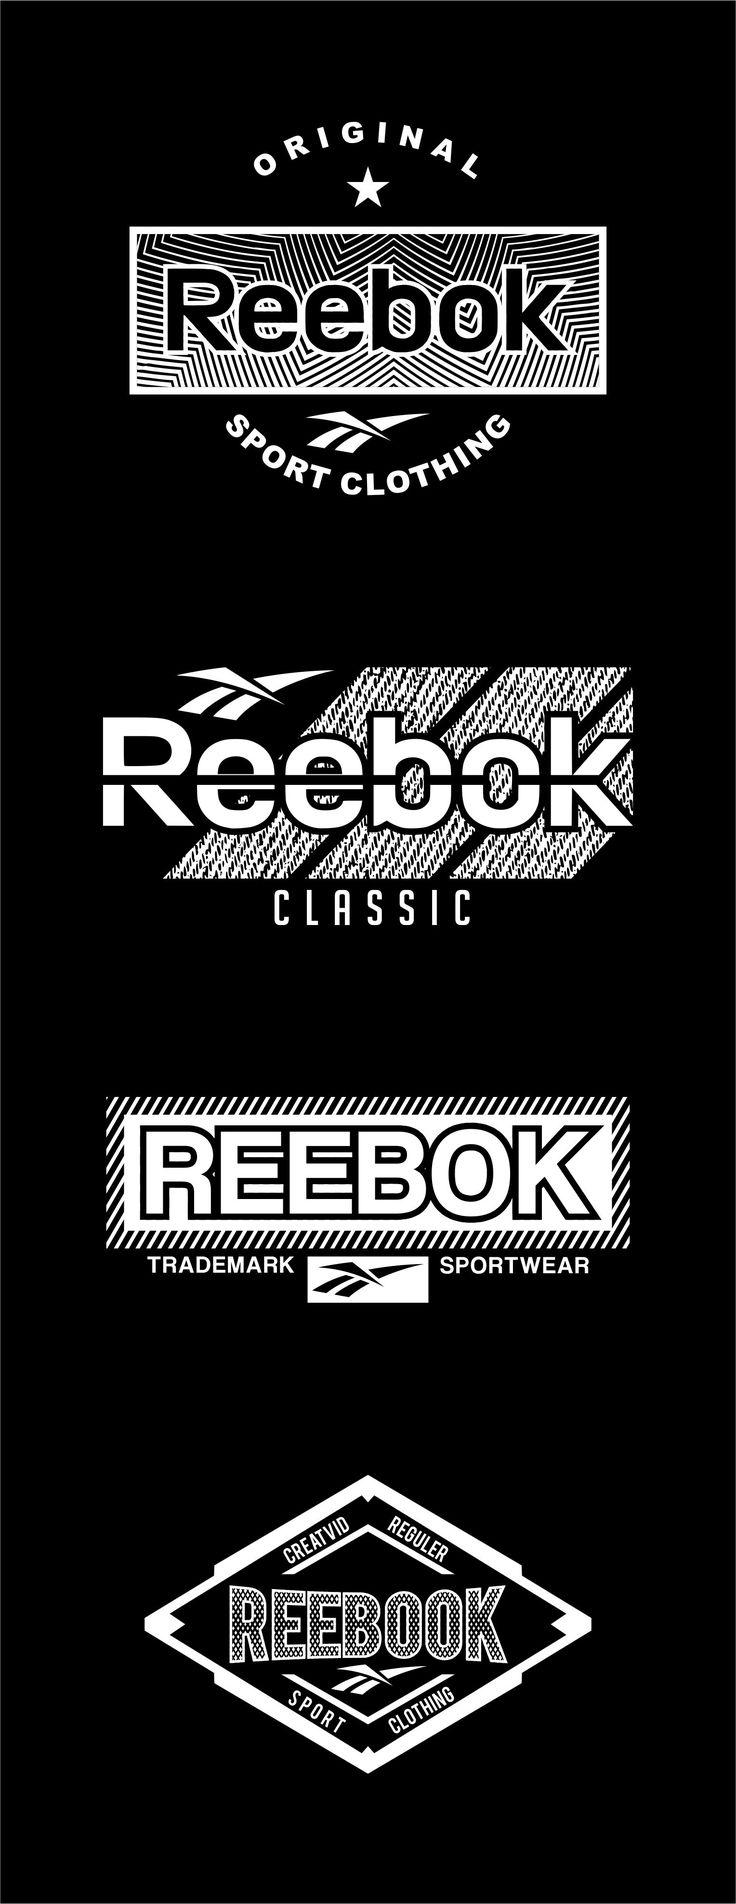 Vintage Vector rebook #vintage #vector #vectorsurf #vintagevector #volcom #adidas #billabong #rusty #nike #puma #levis #quiksilver #ripcurl #dc #vans #spyderbilt #reebok